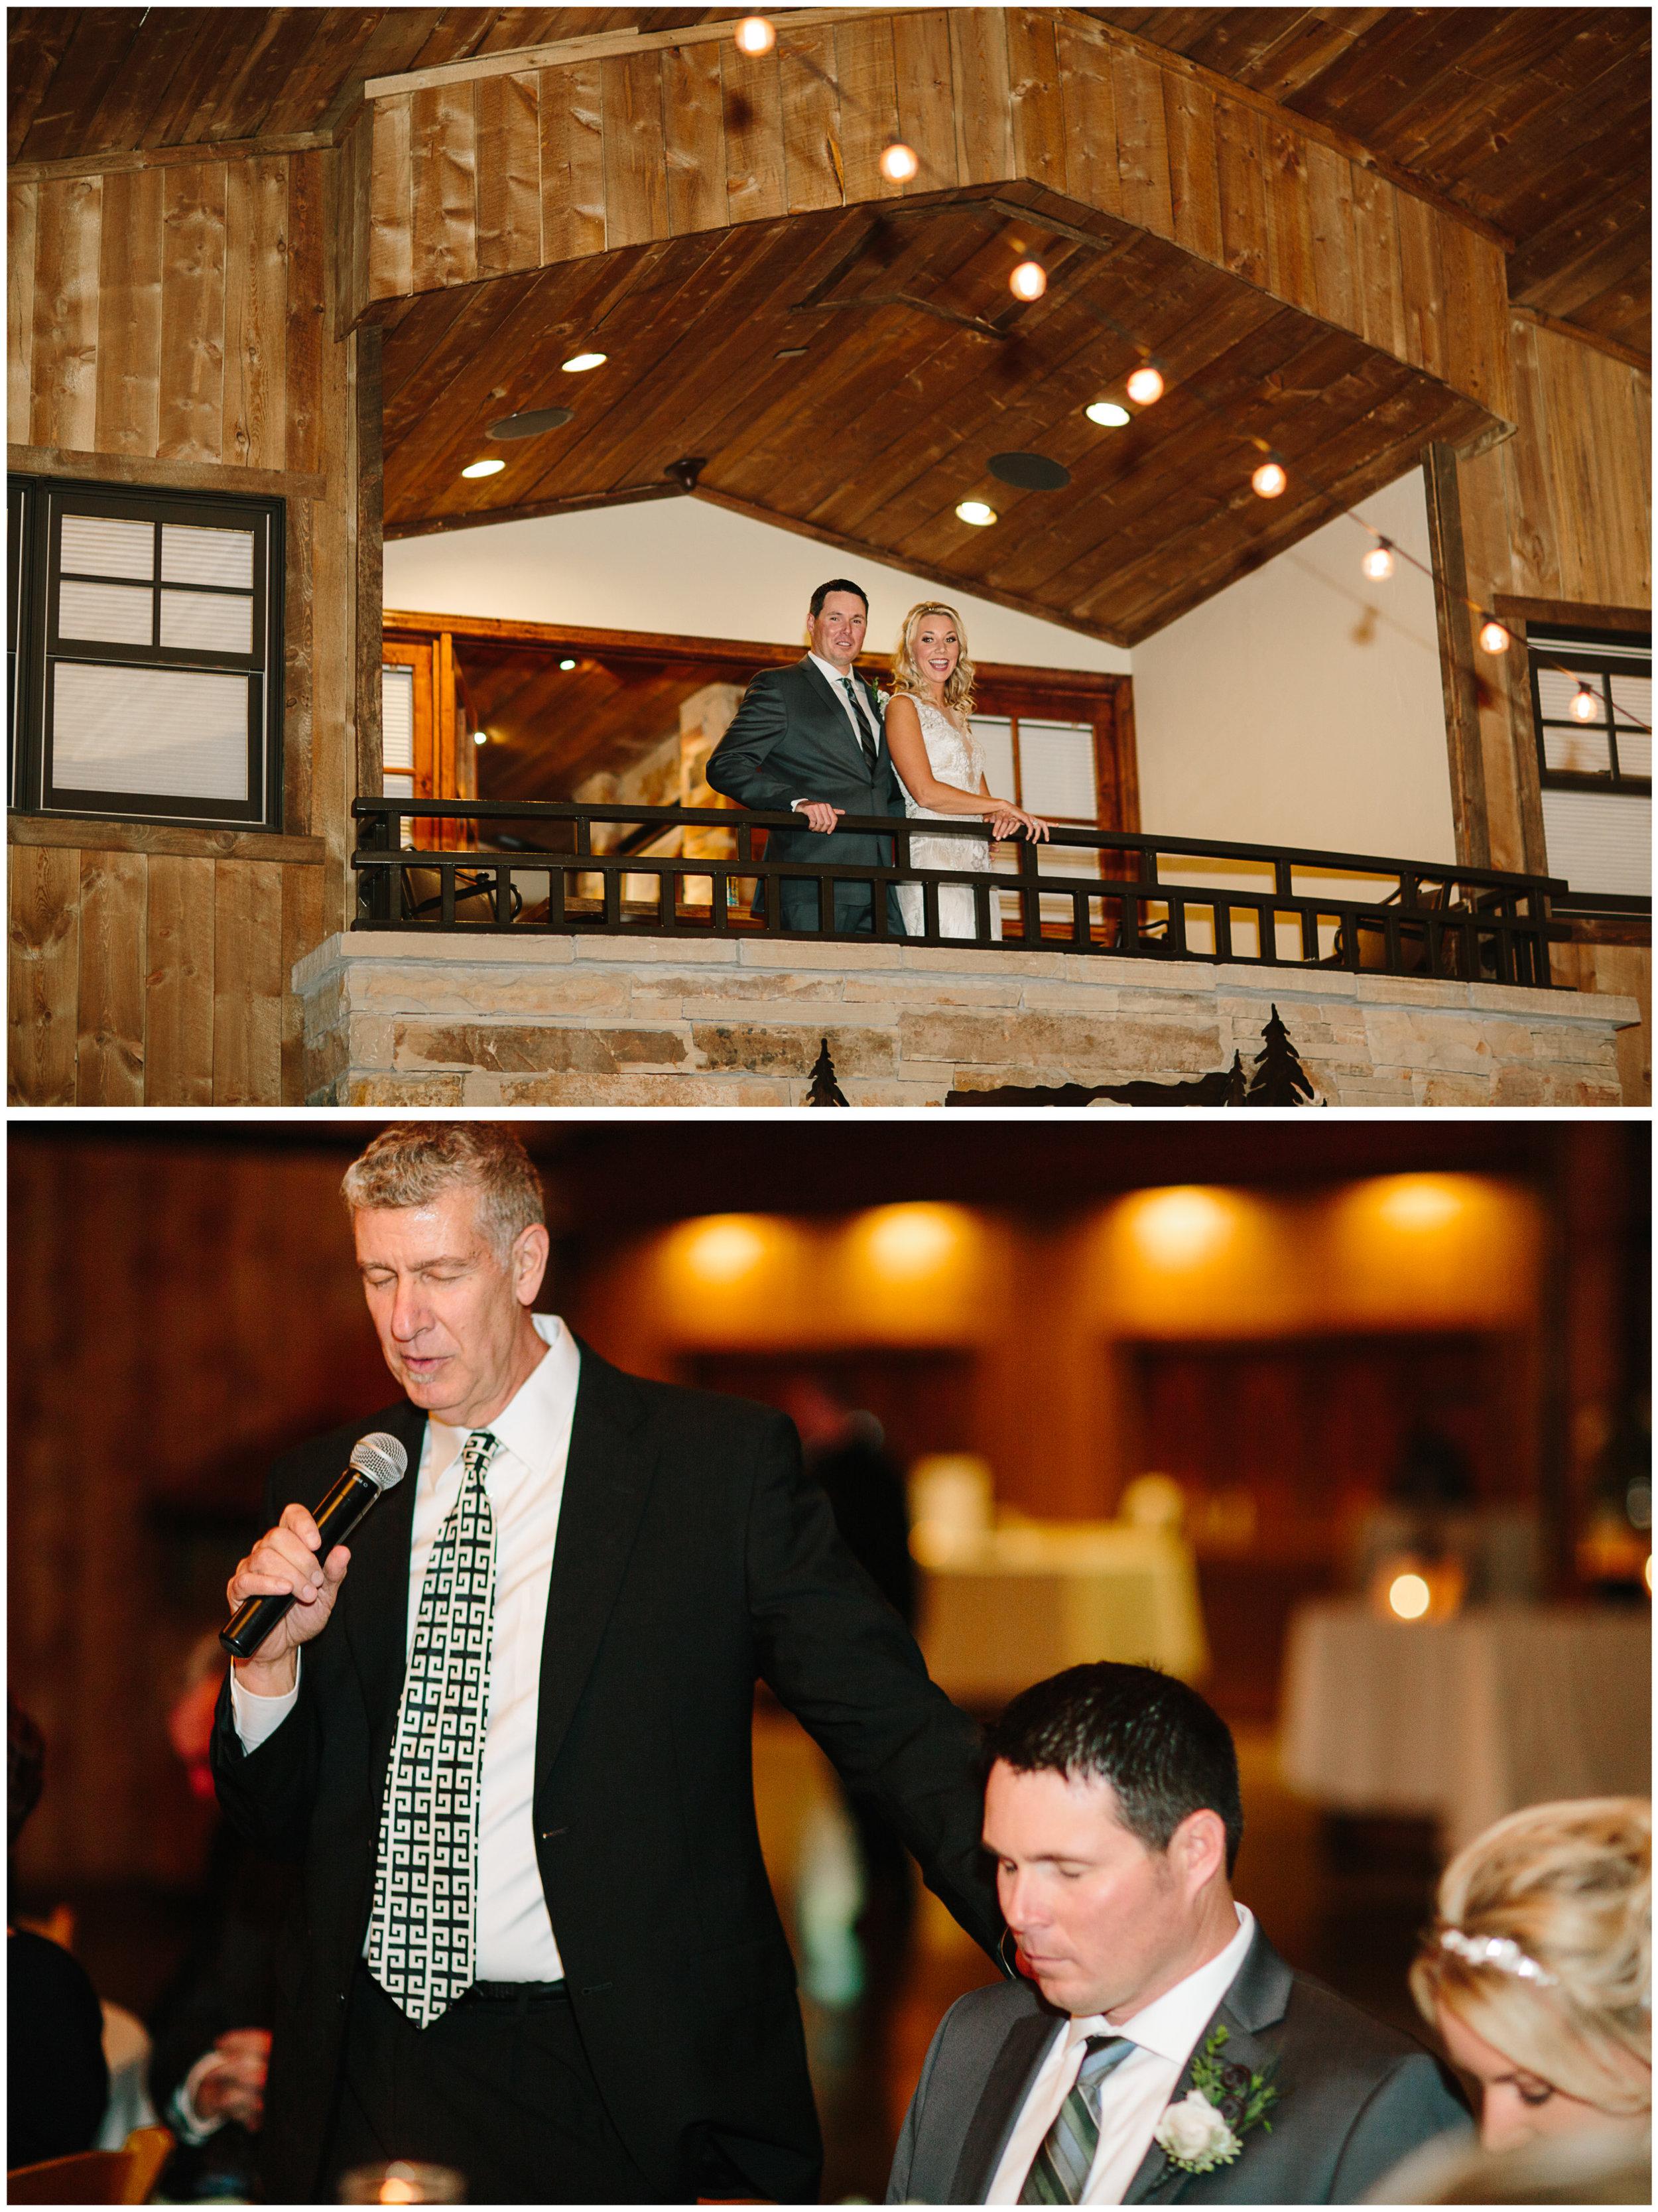 spruce_mountain_ranch_wedding_65.jpg